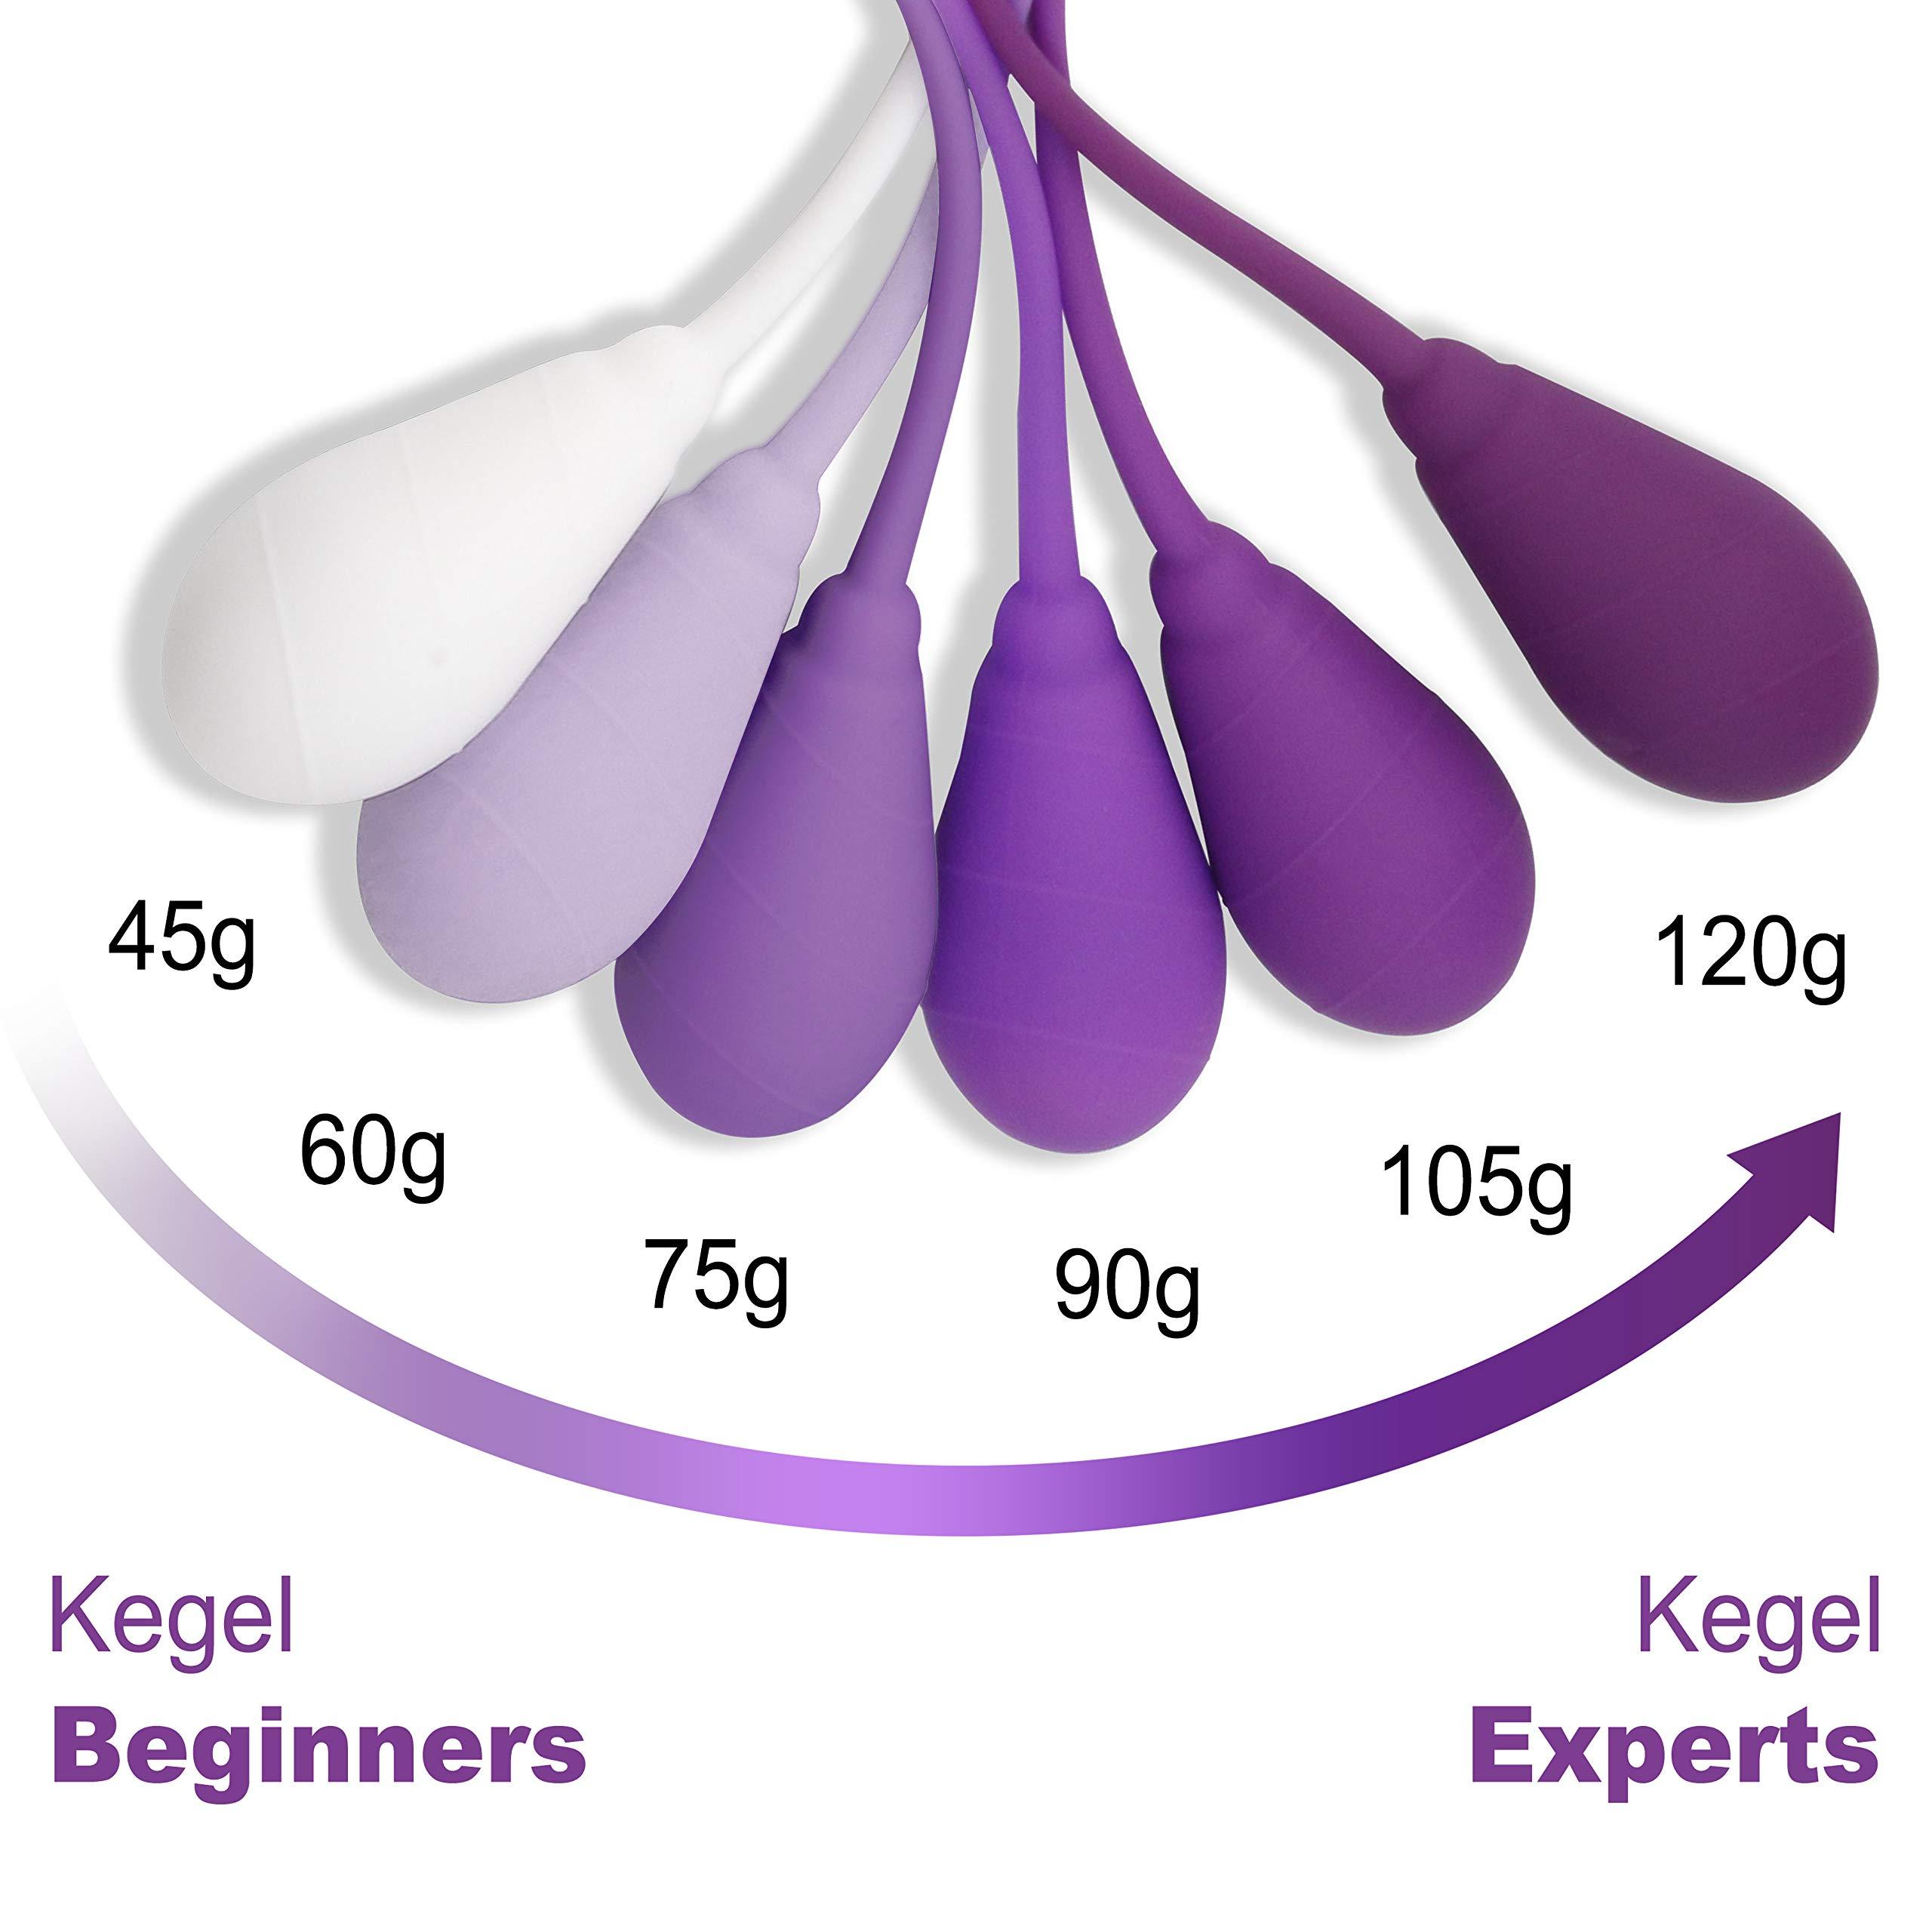 Kegel Exercise Weights Ben Wa Balls for Bladder Control & Pelvic Floor Exercises - Set of 6 Premium Silicone Vaginal Tighten Strengthen &Training Kegel Balls for Women Beginners & Advanced